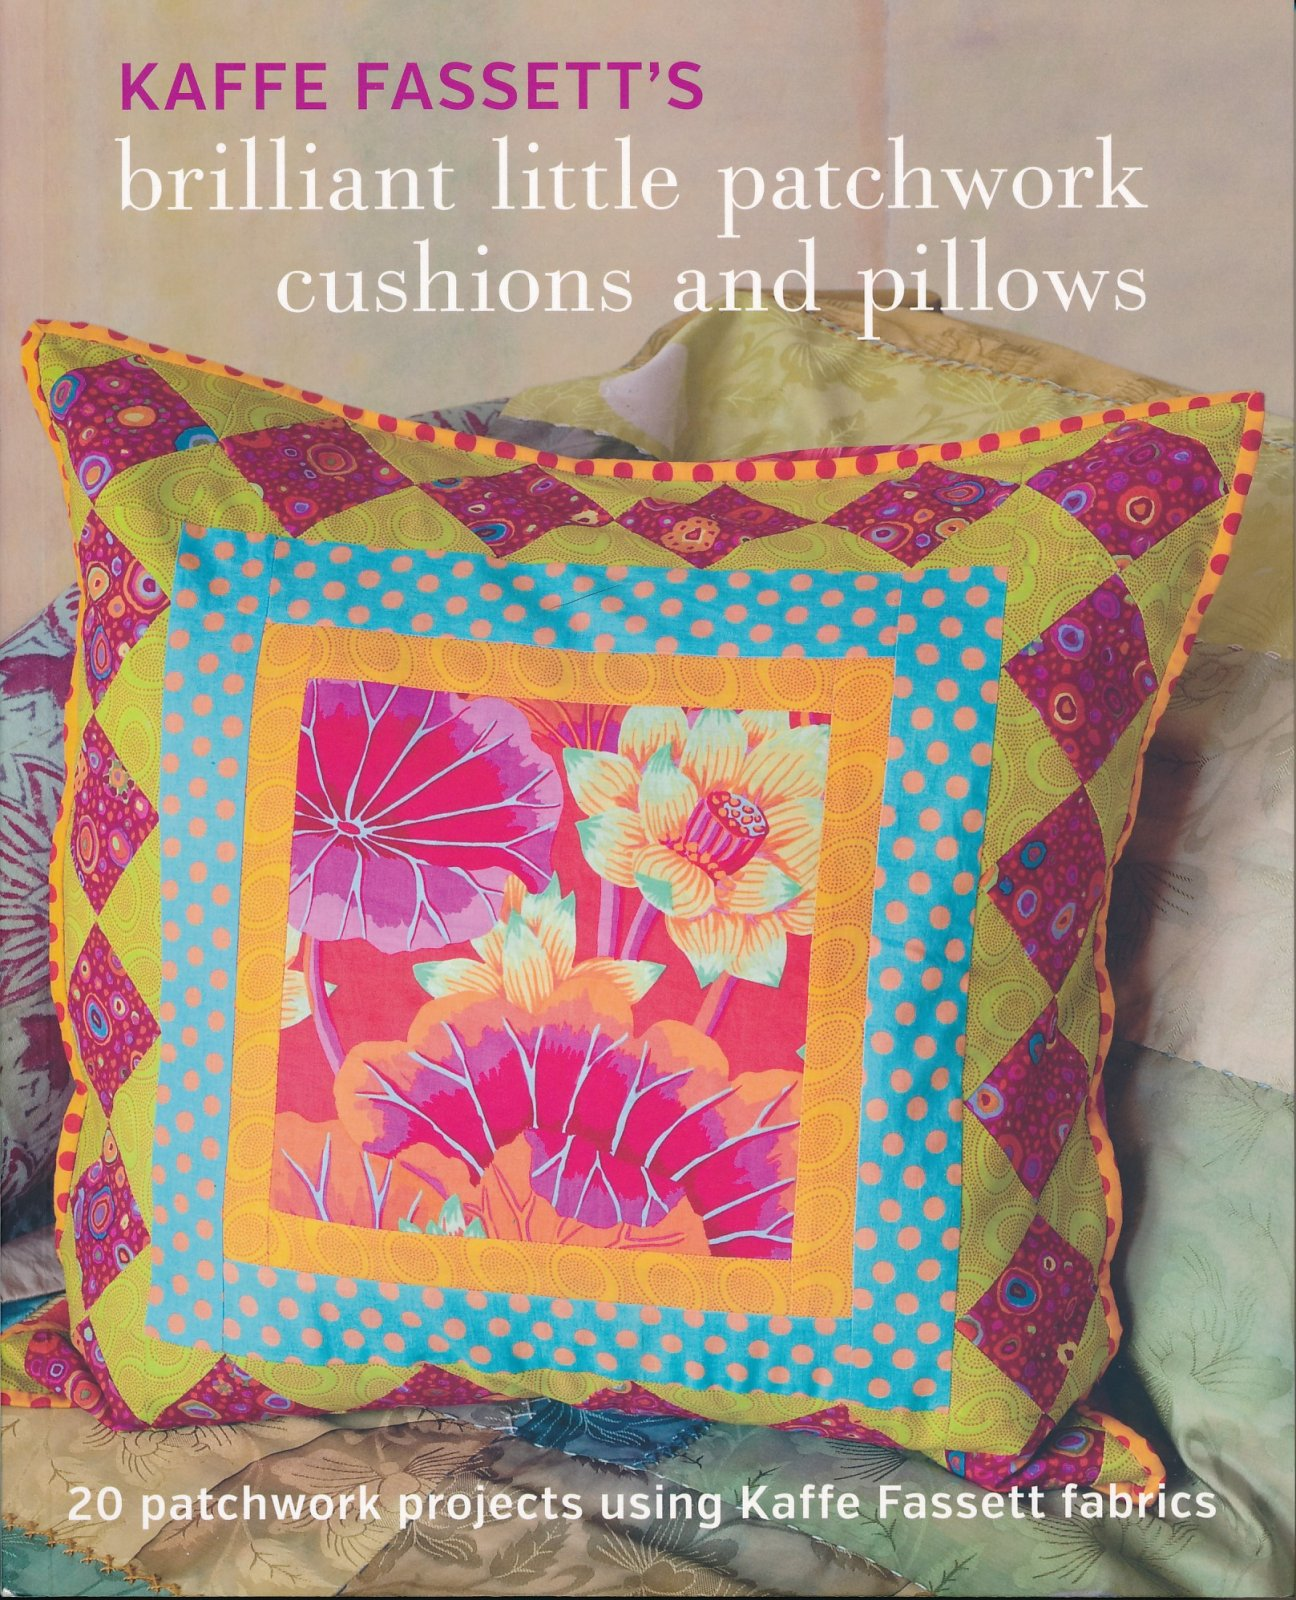 Kaffe Fassett: Brilliant Little Patchworks - Cushions and Pillows